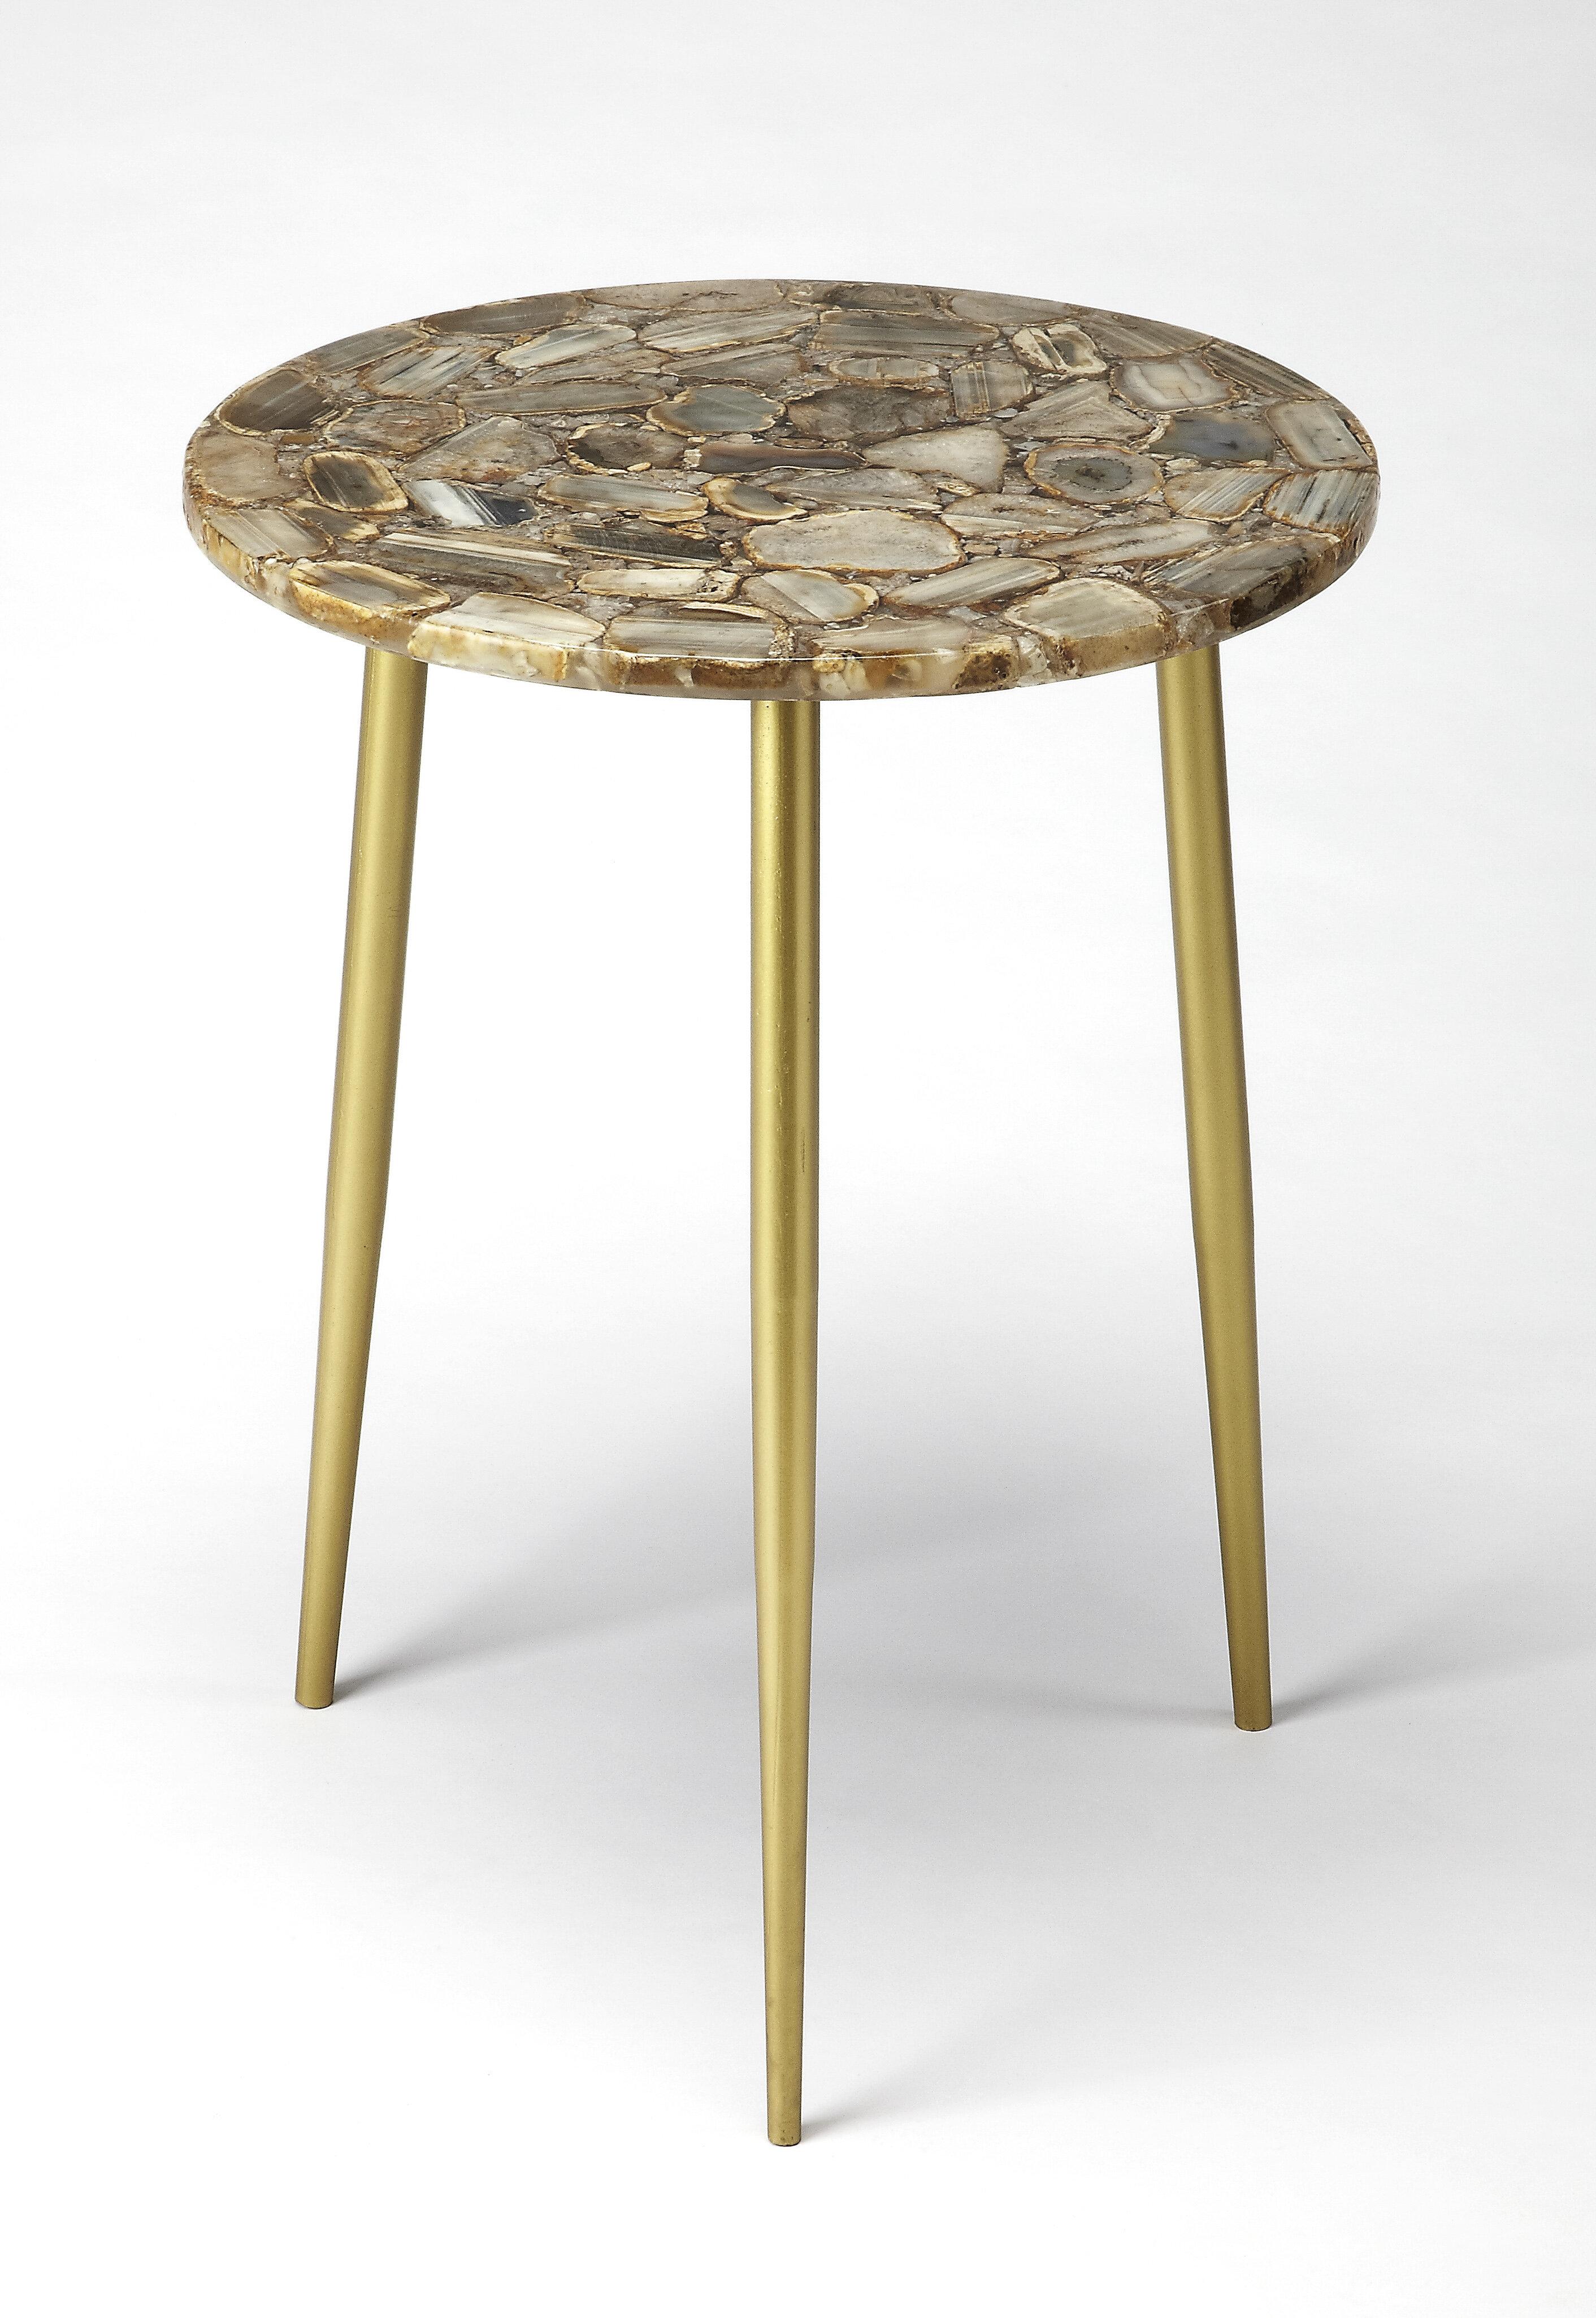 Superbe Everly Quinn Briley Agate End Table | Wayfair